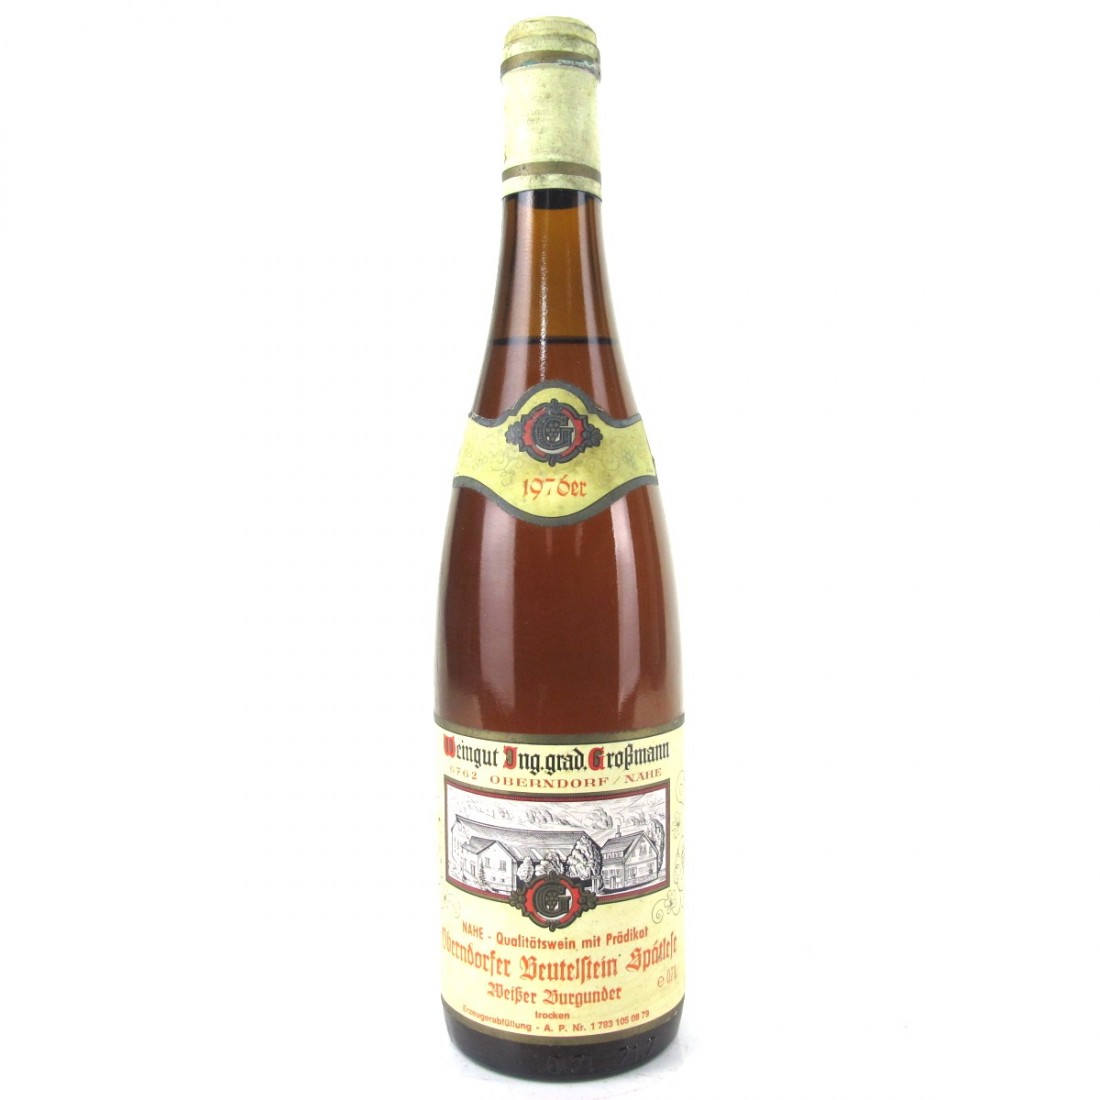 Großmann Pinot Blanc Spatlese 1976 Nahe